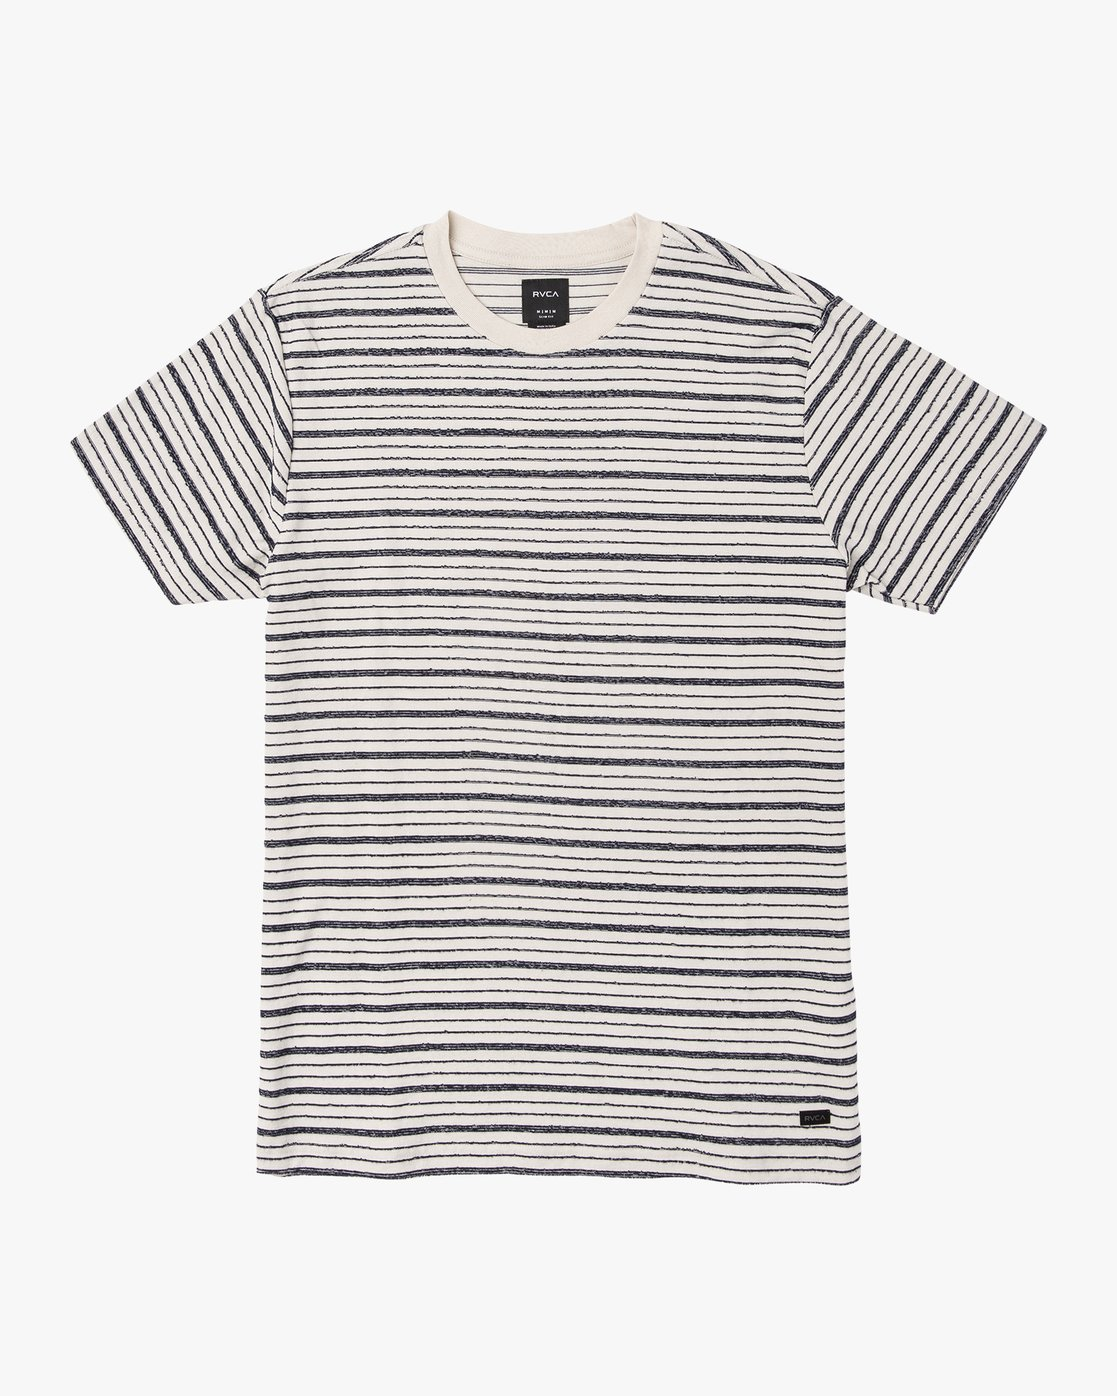 0 Amenity Stripe Knit T-Shirt Silver M906VRAT RVCA